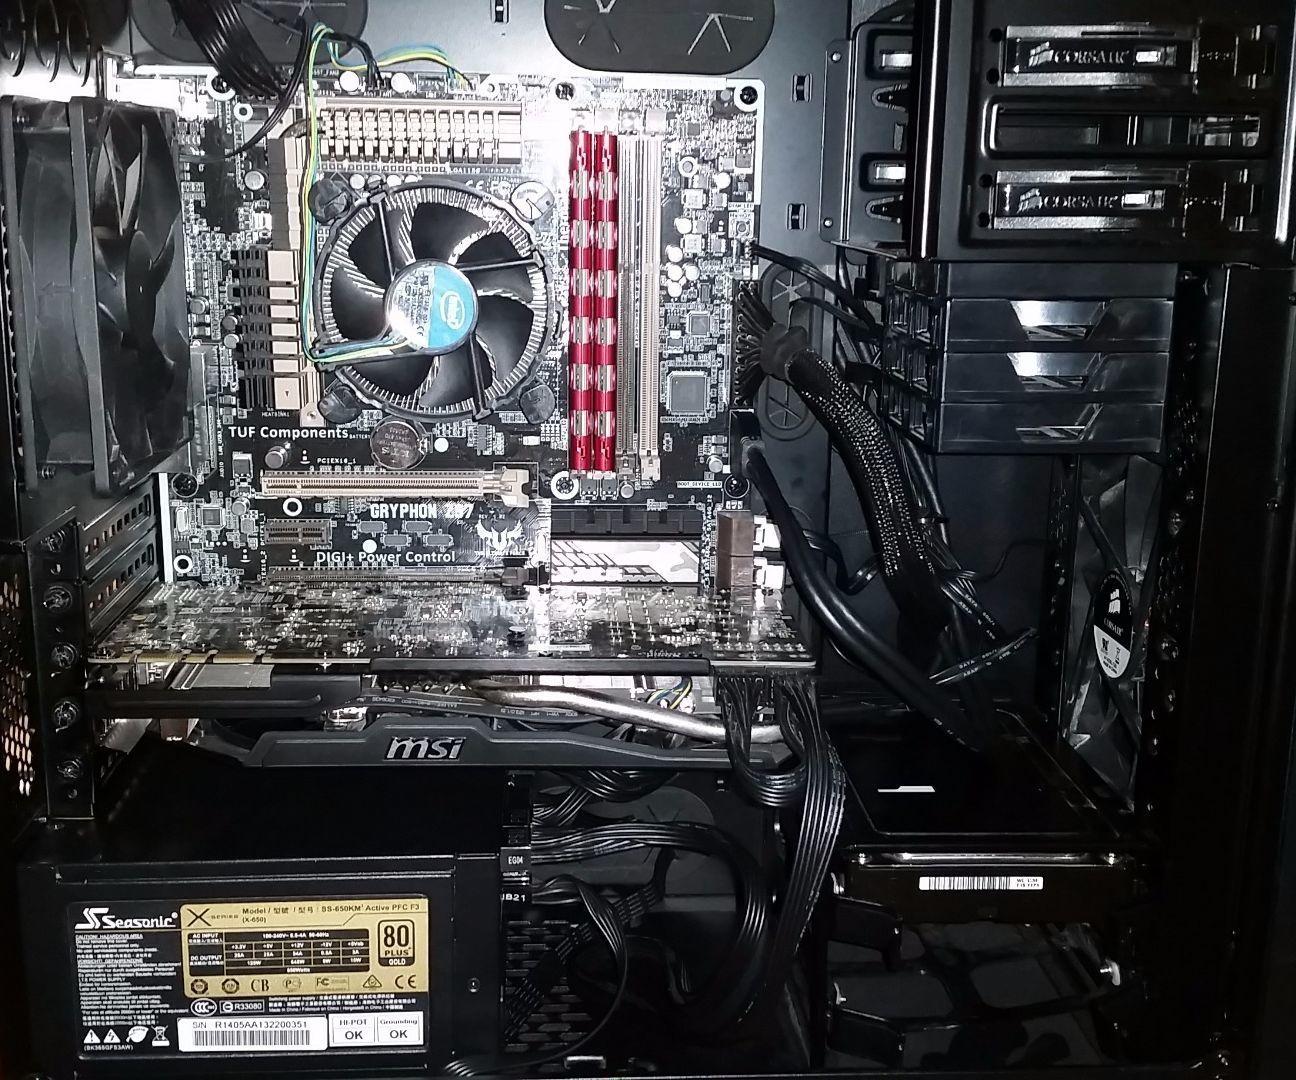 How to Build a Desktop Computer